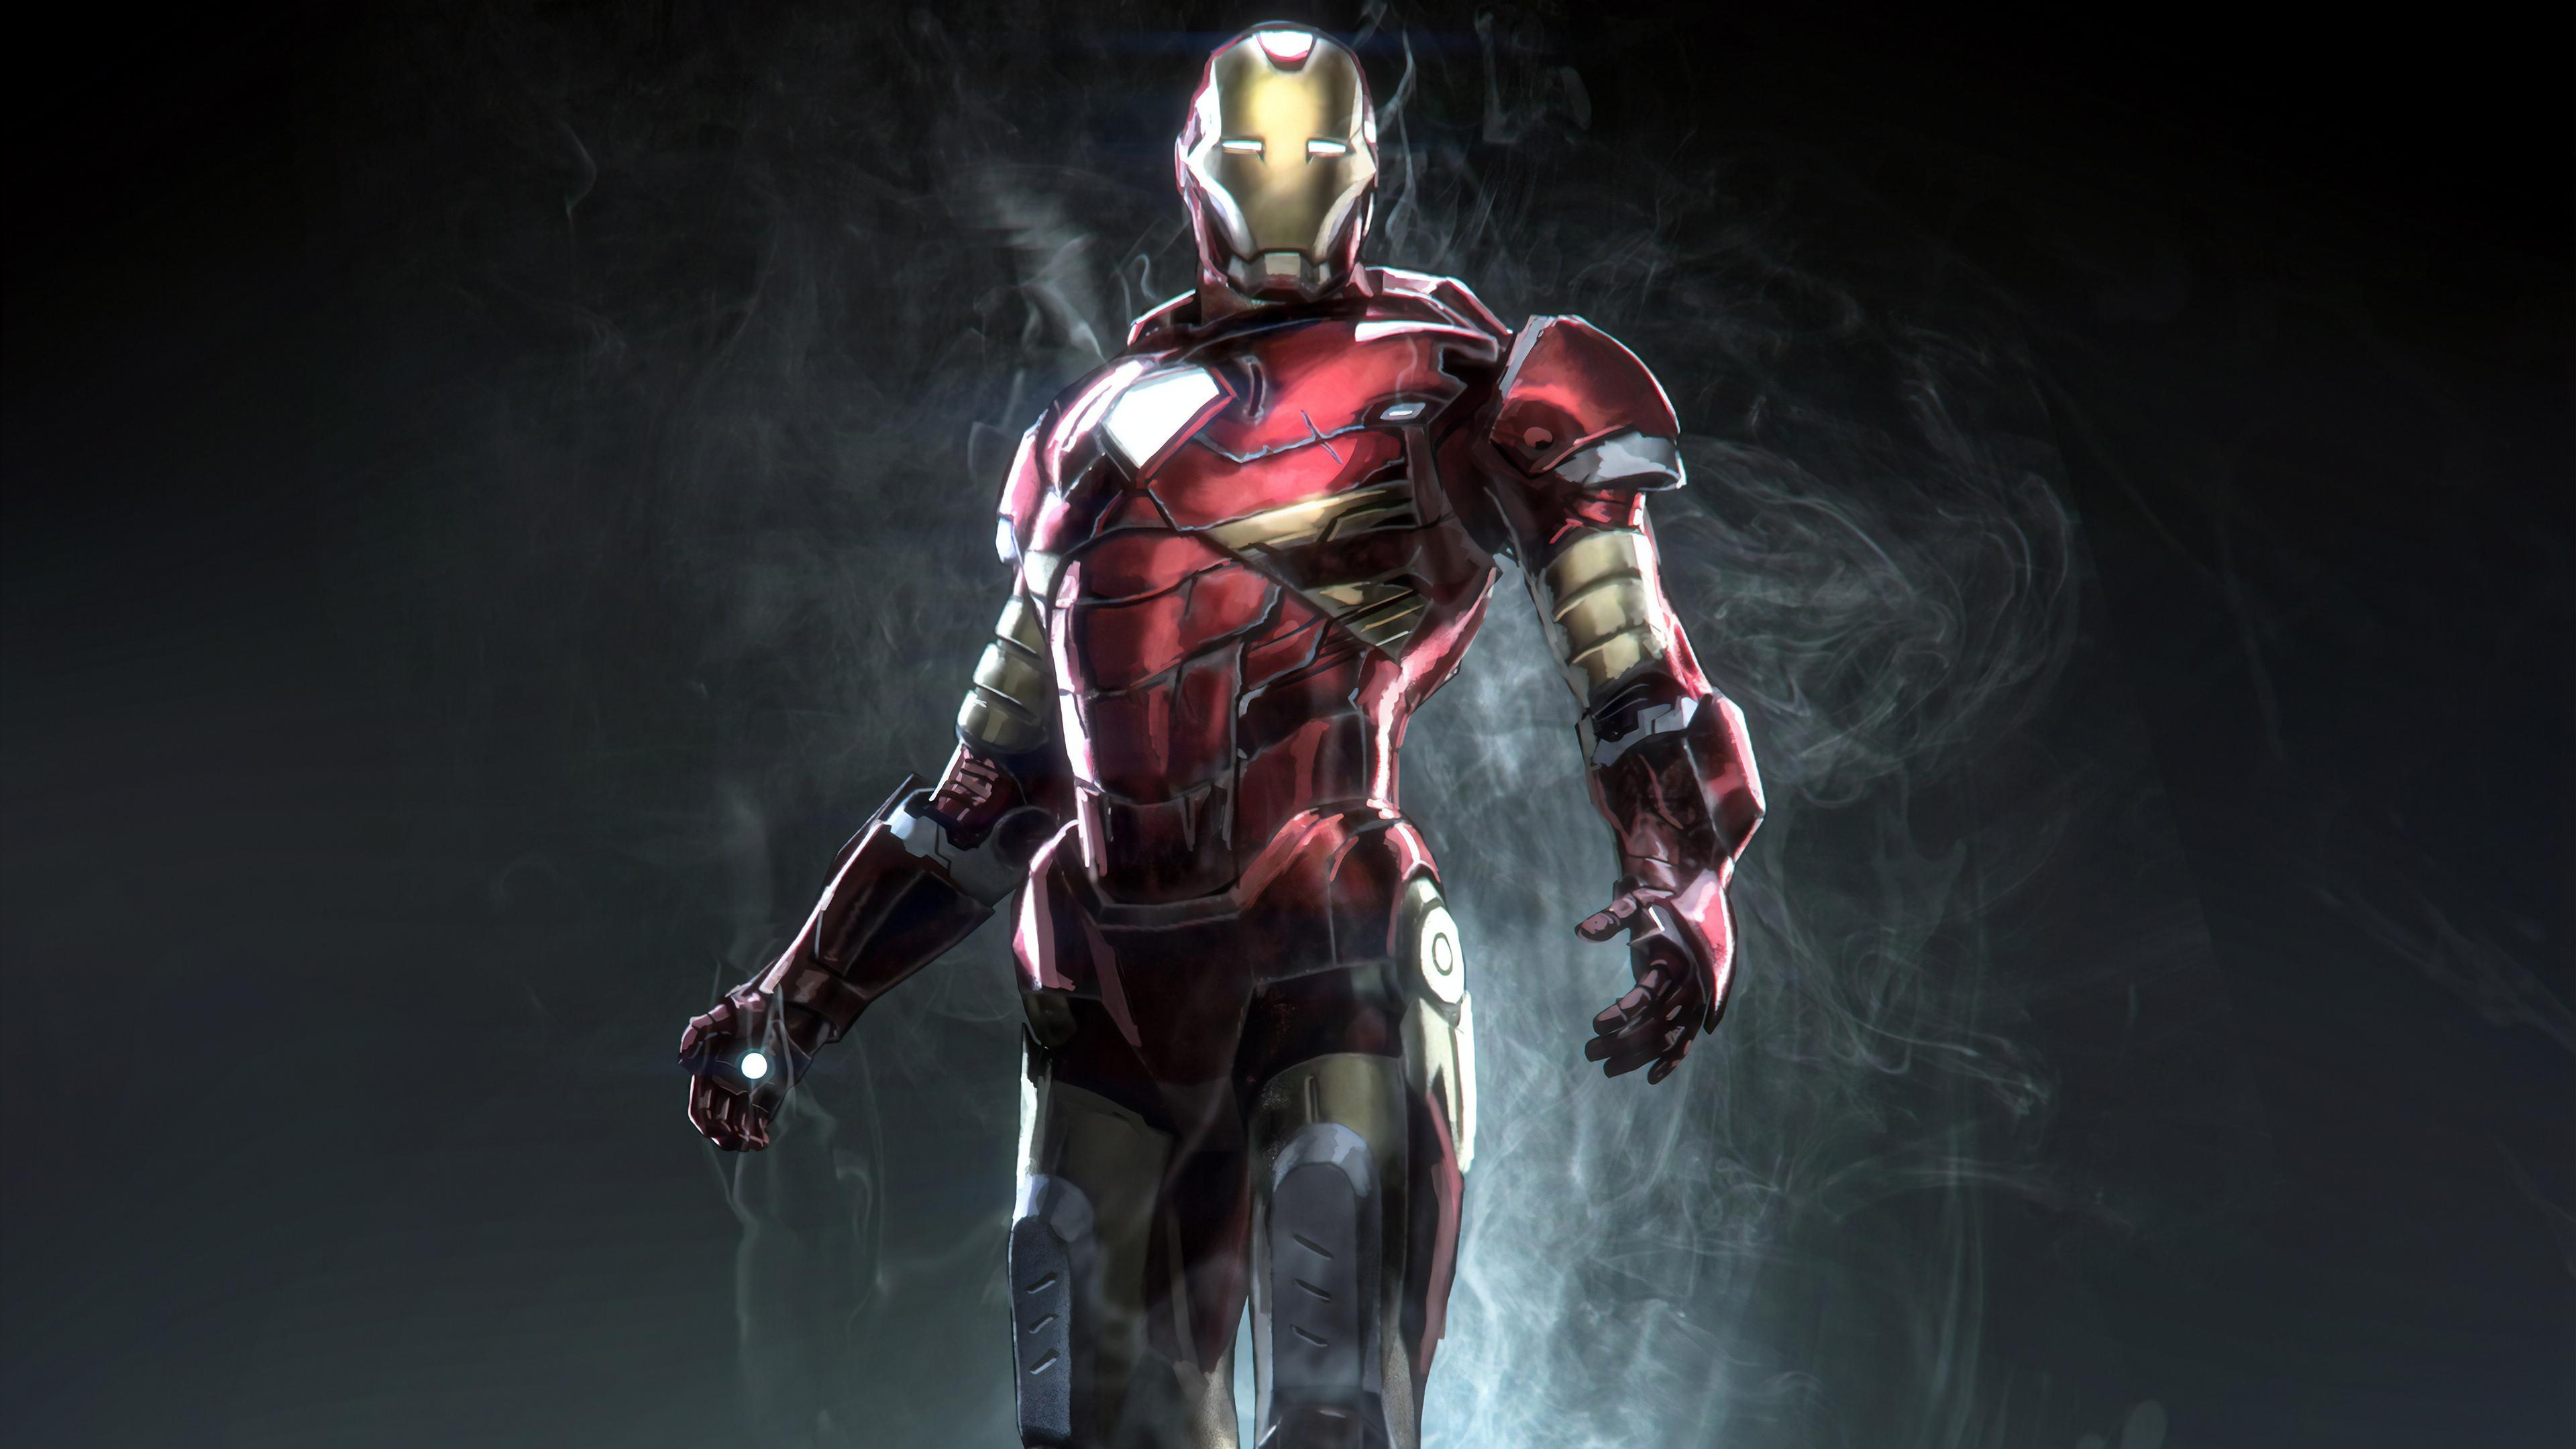 iron-man-marvel-superhero-98.jpg